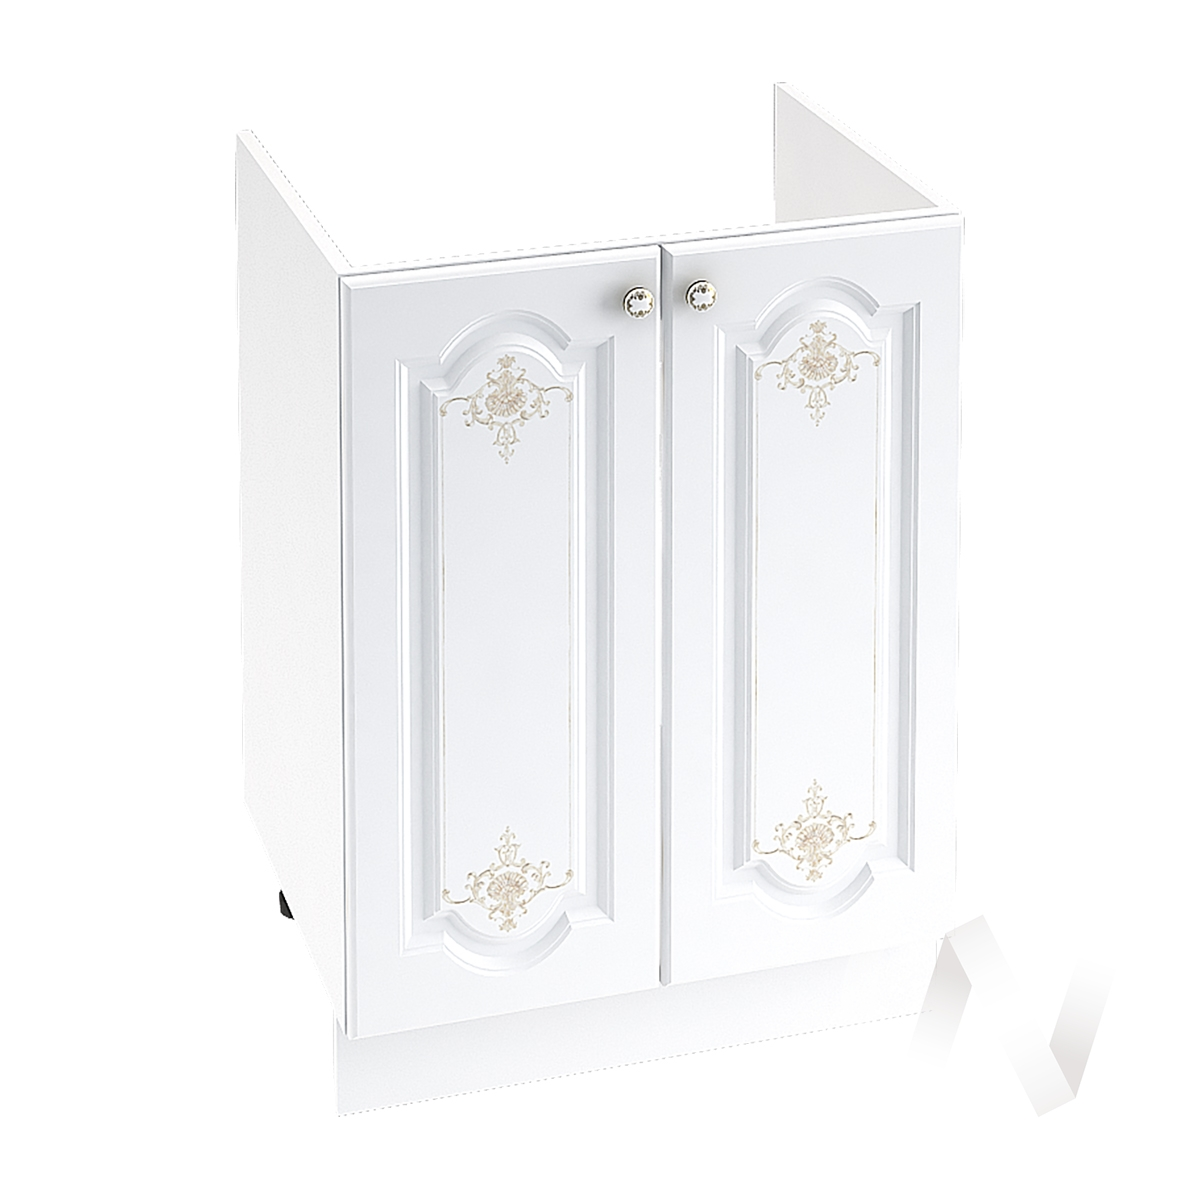 "Кухня ""Шарлиз"": Шкаф нижний под мойку 600, ШНМ 600 (корпус белый)"